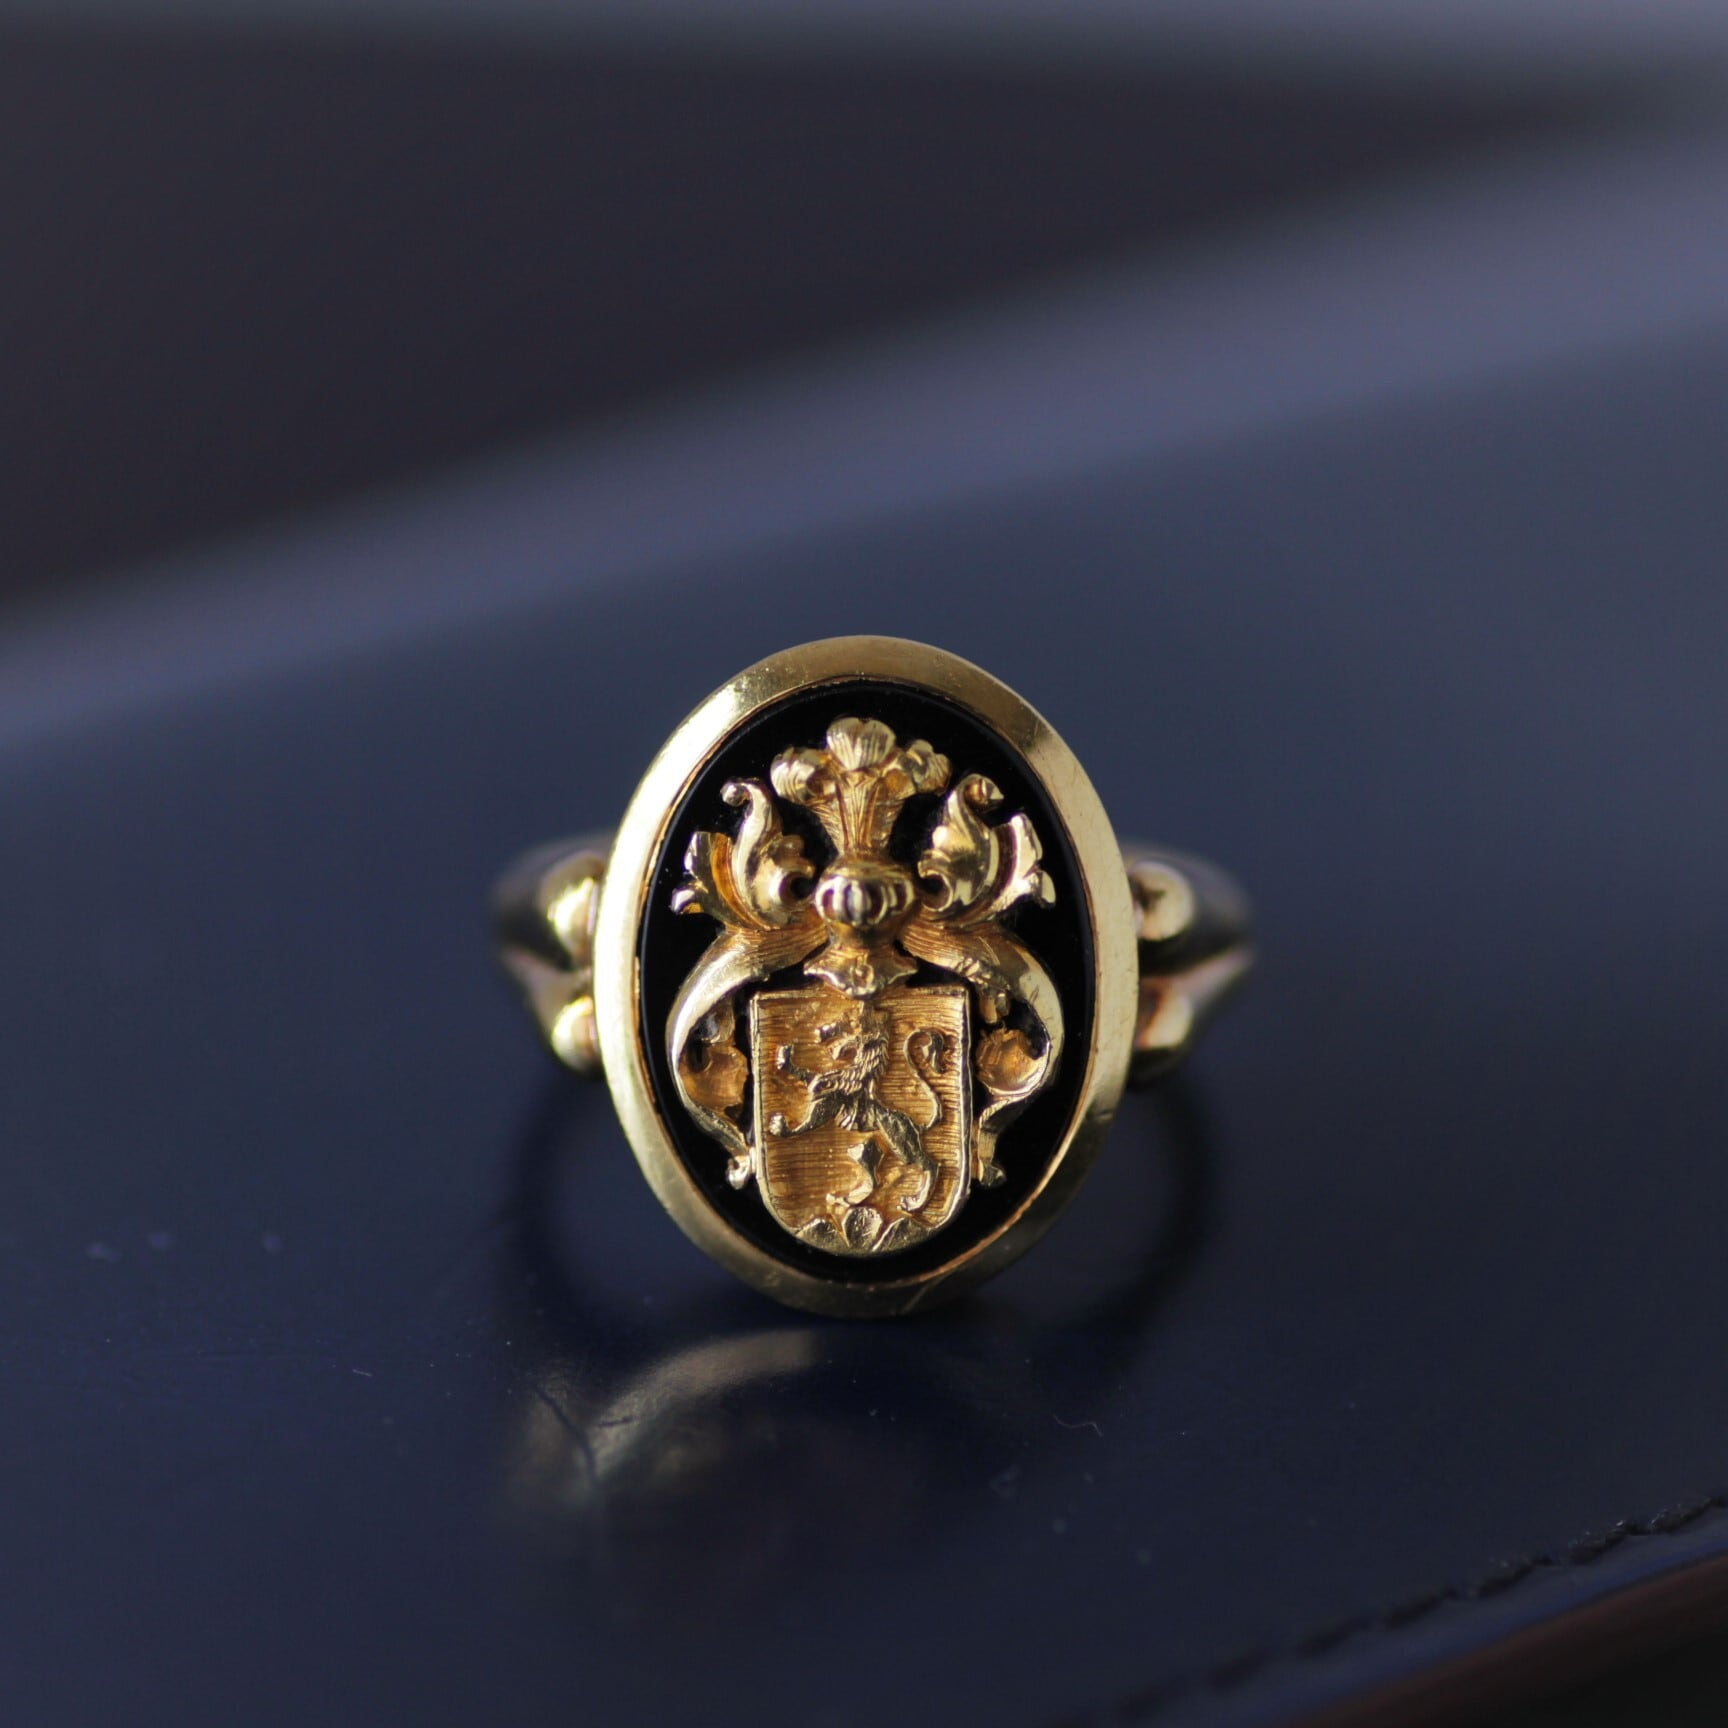 Gold Crest & Onyx Gold Ring   ゴールドクレスト & オニキス ゴールドリング